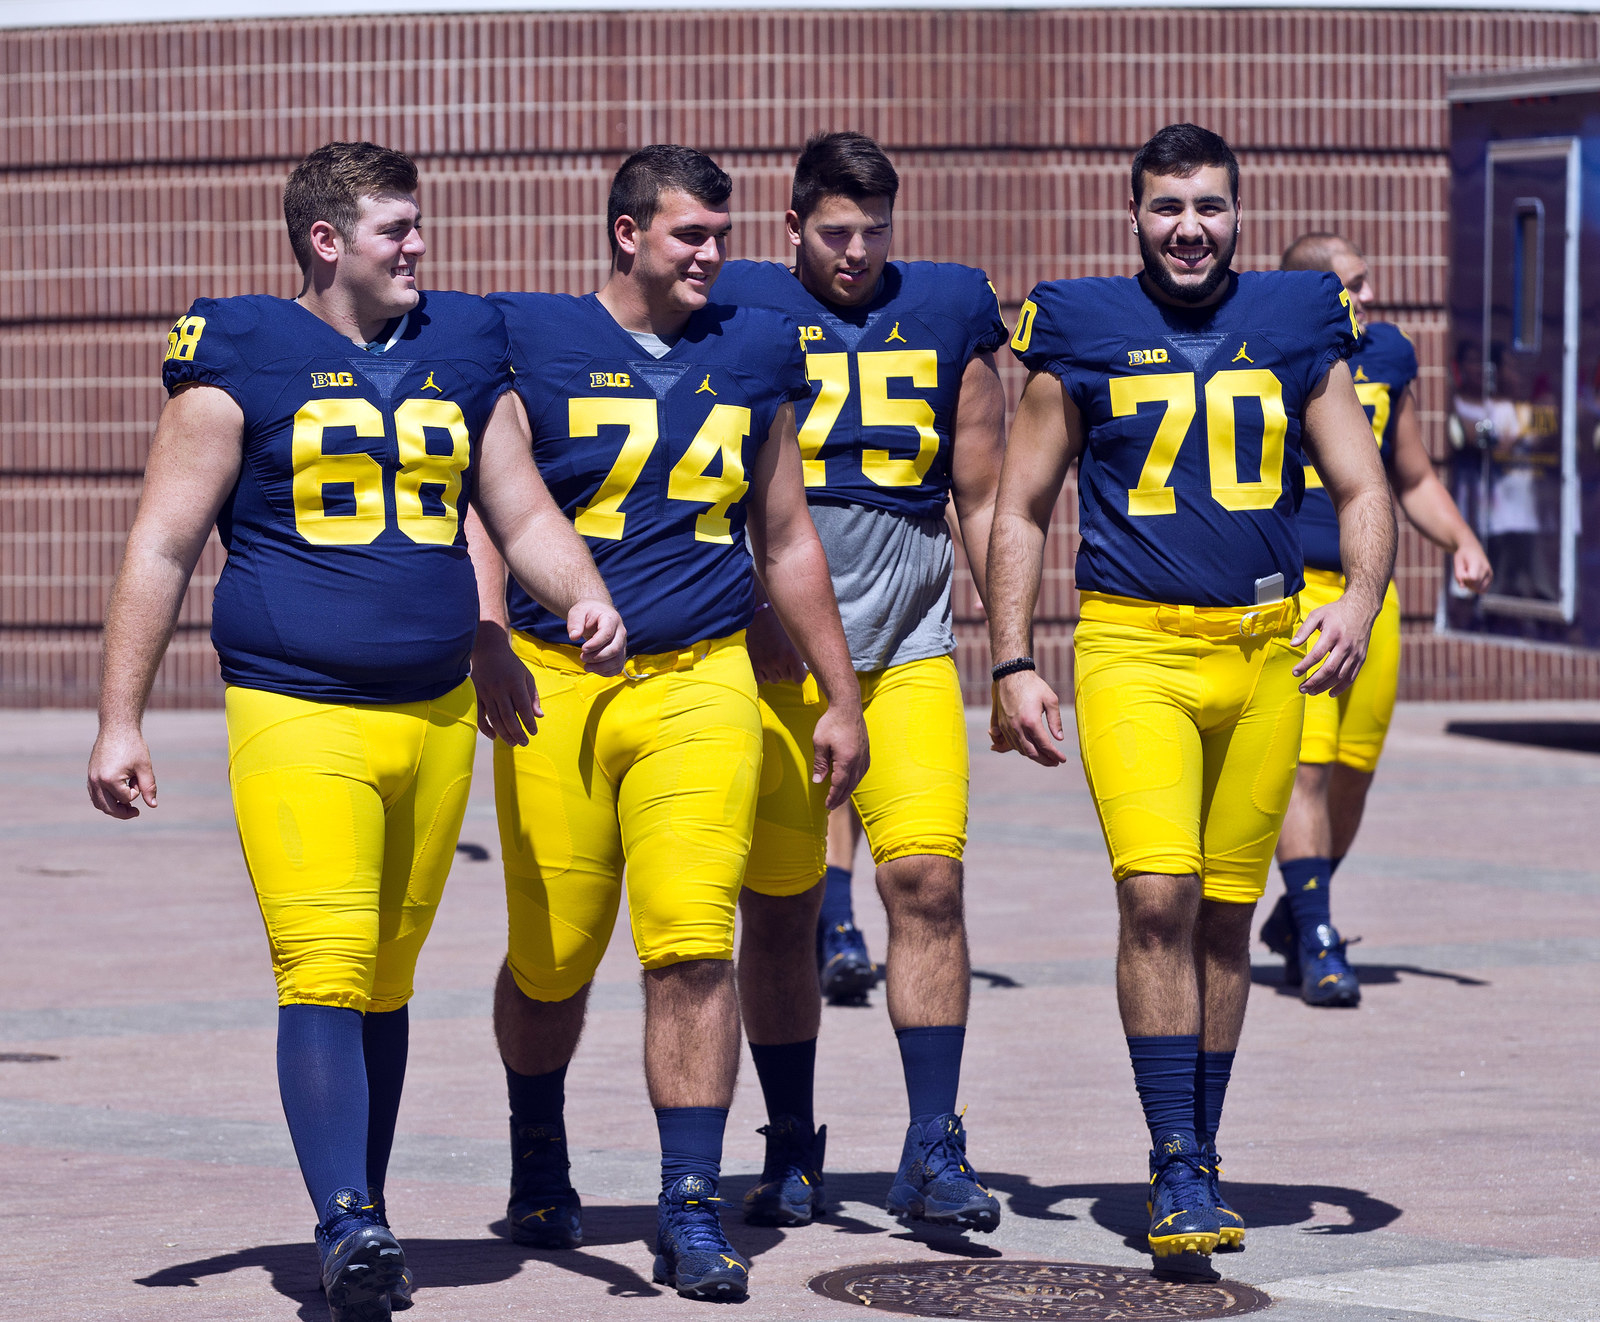 Tinder Ranks America's Top College Football Schools